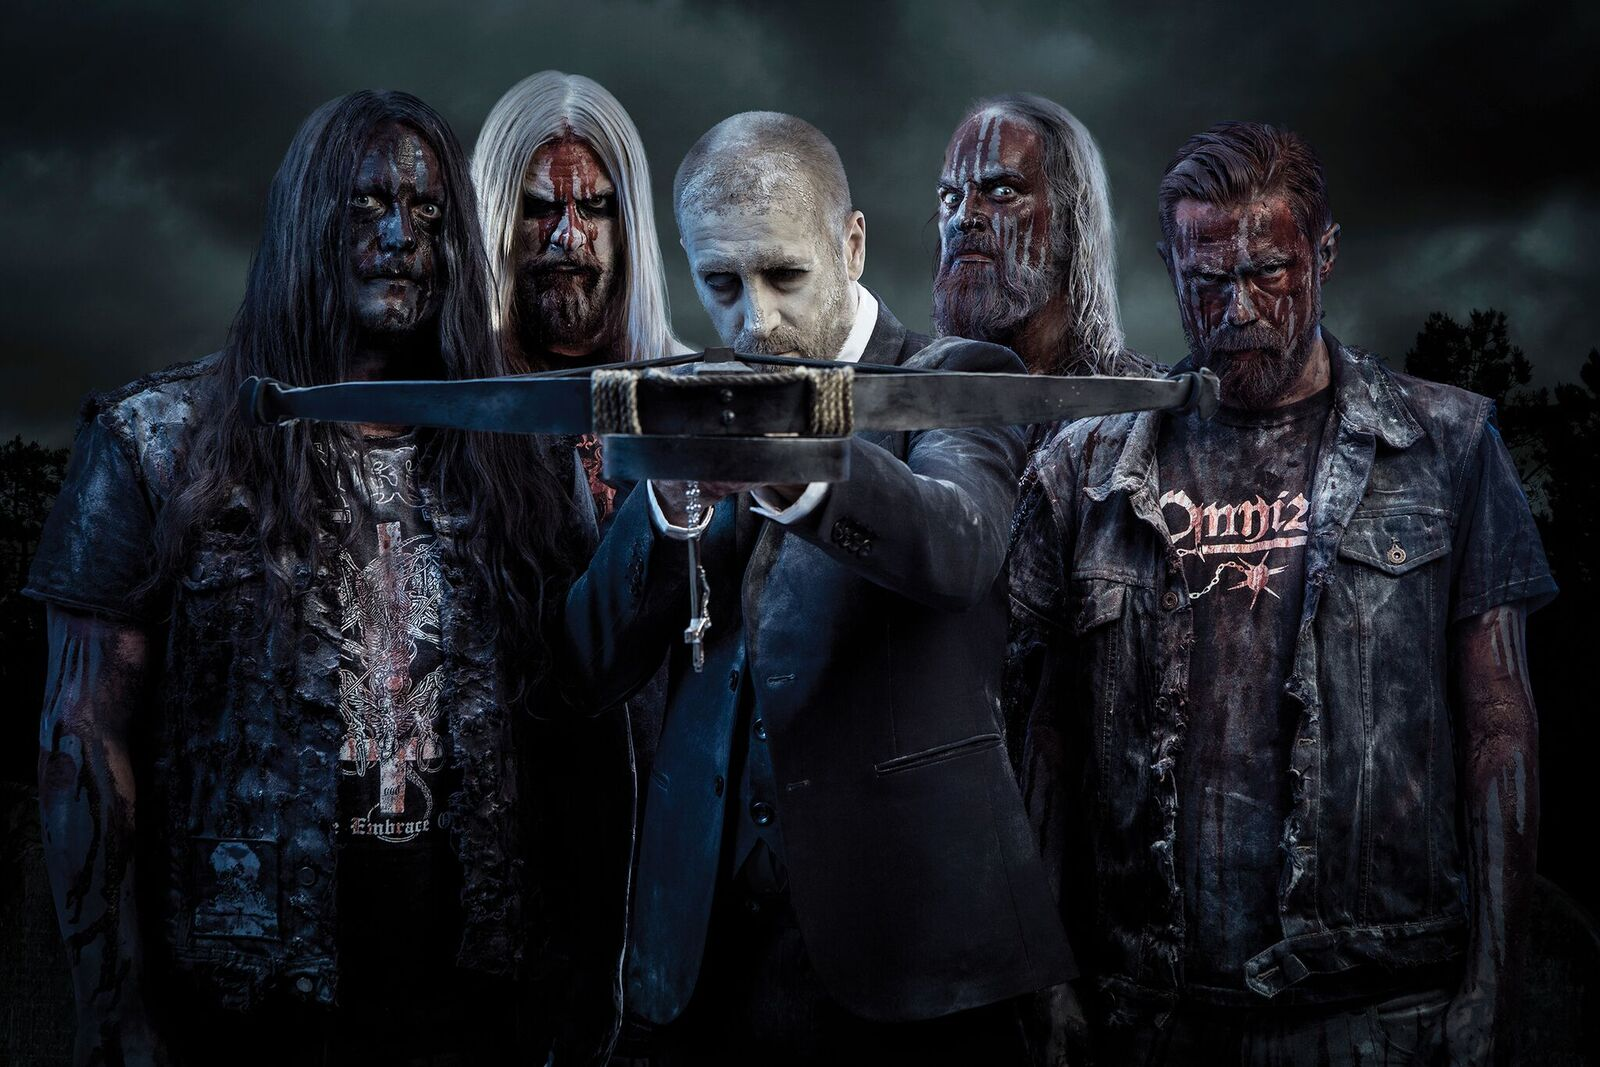 Bloodbath reveal their new studio album 'The Arrow of Satan is Drawn'